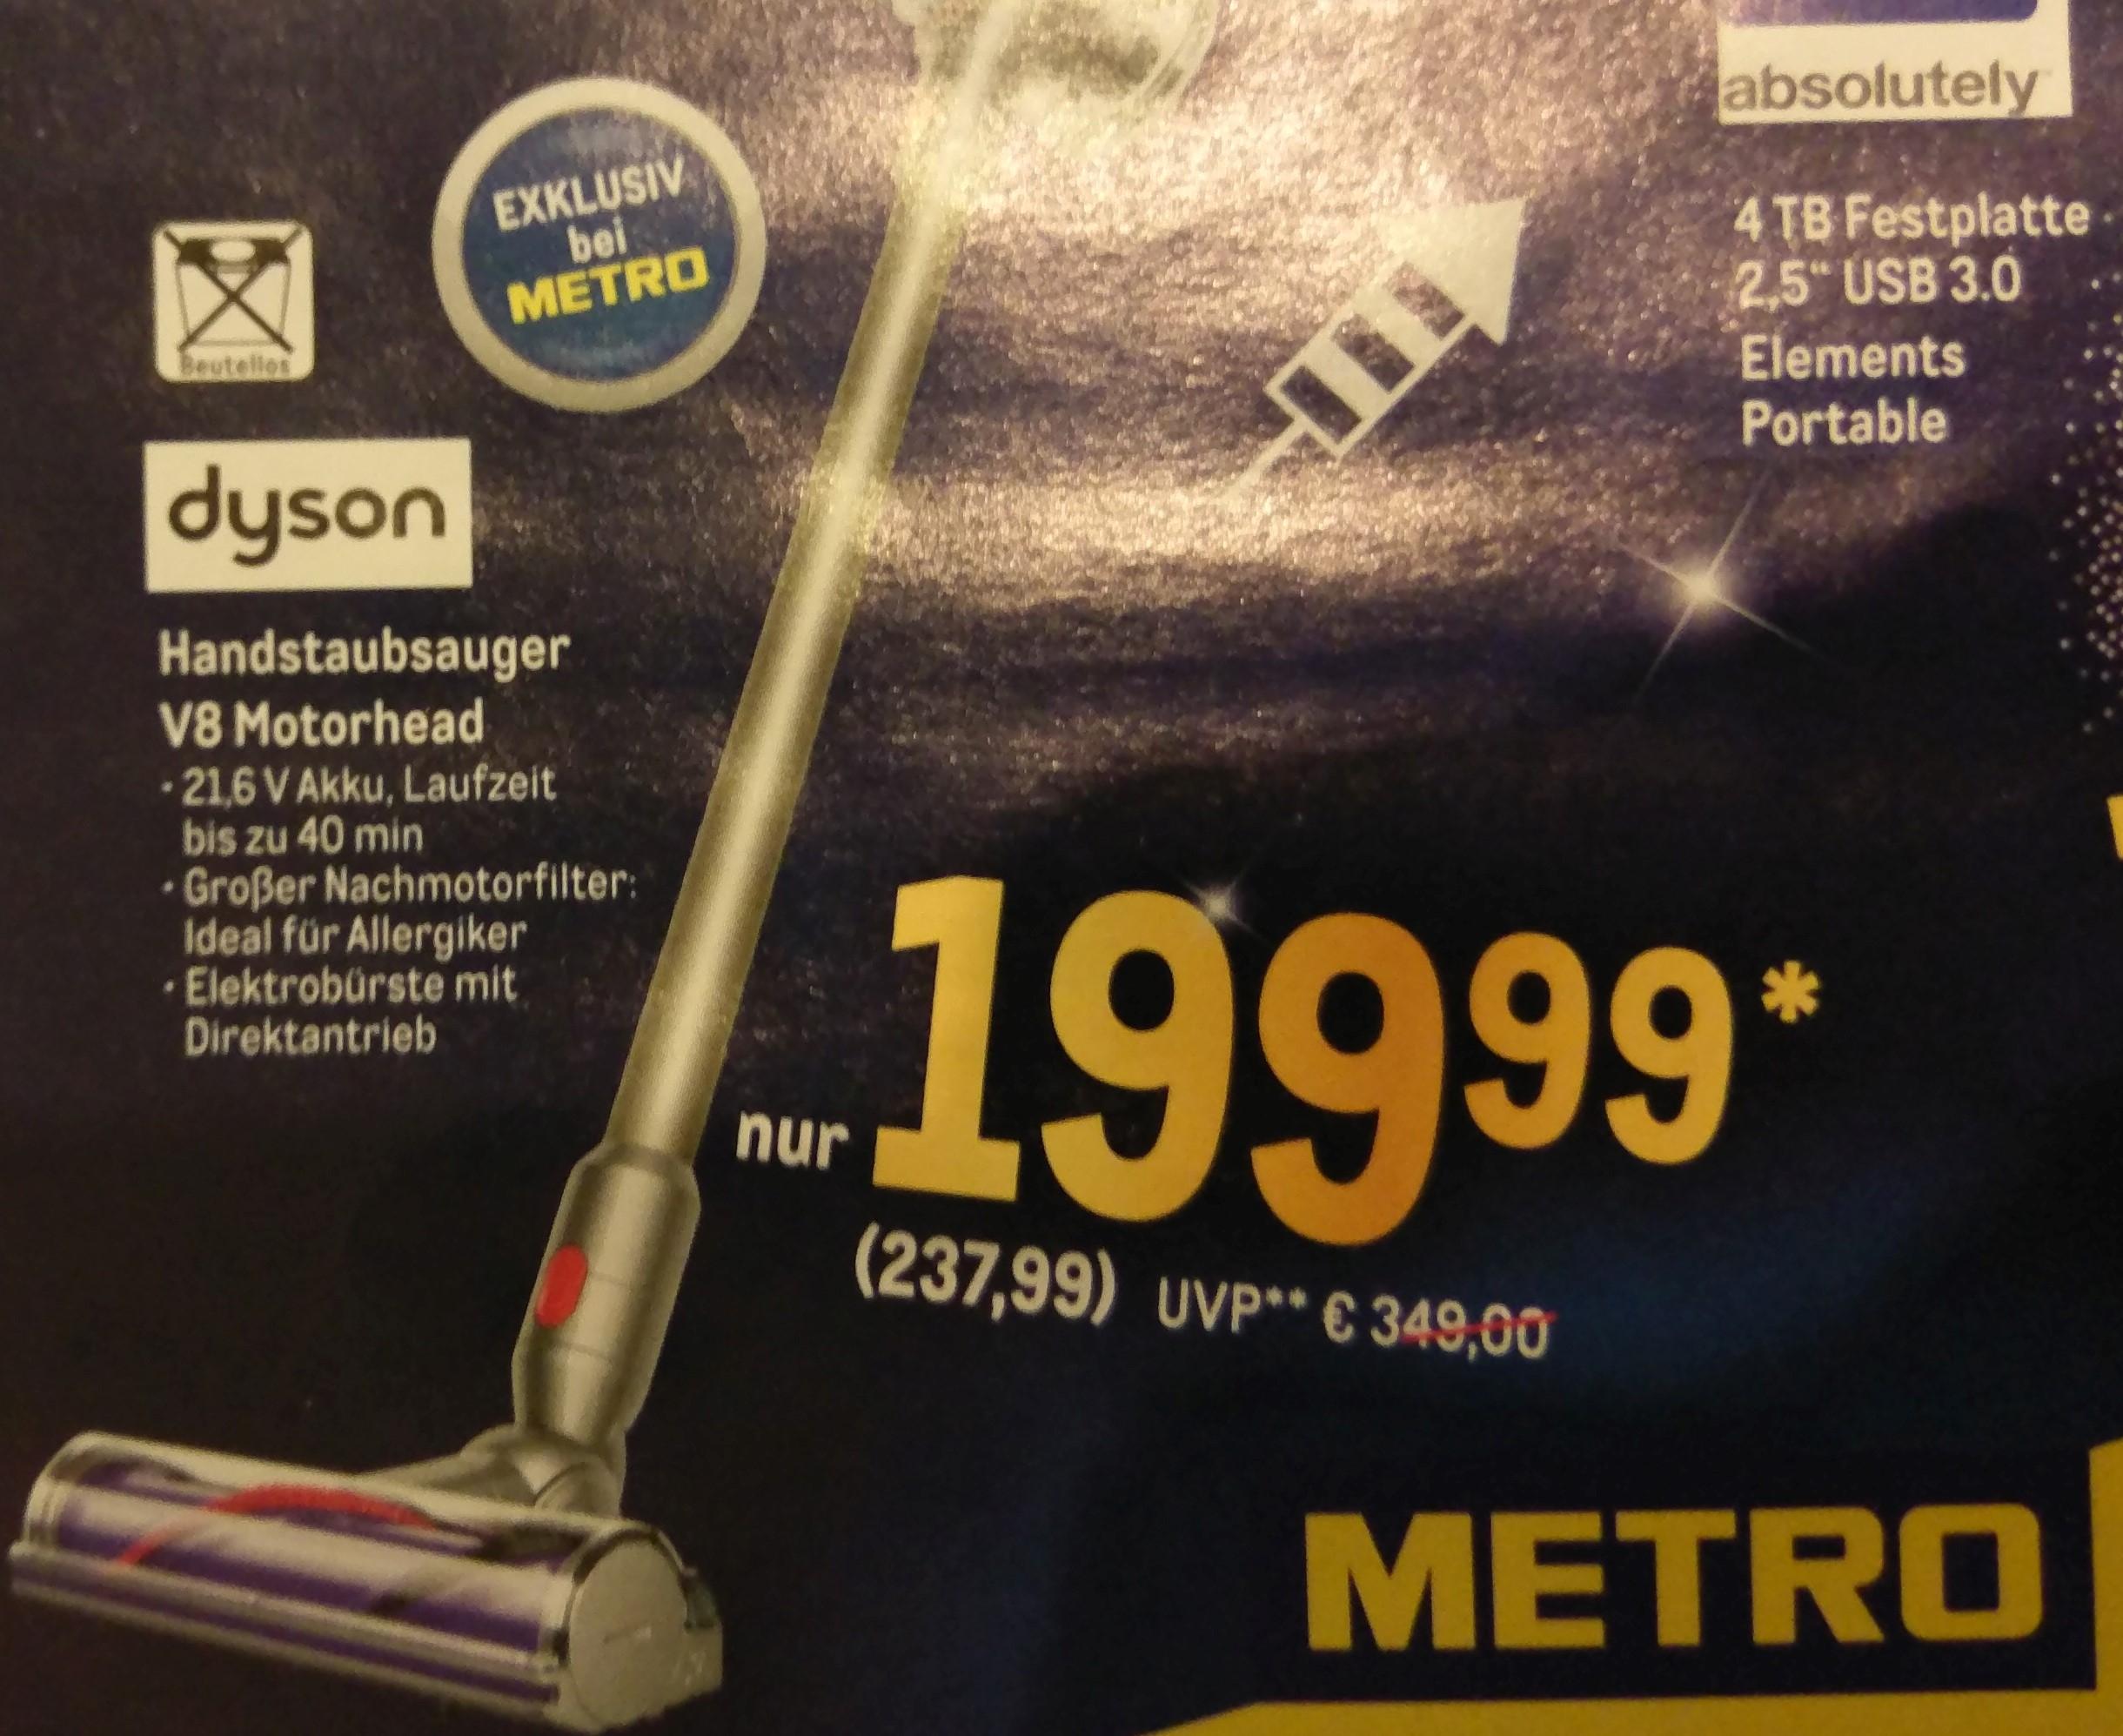 [Metro] Dyson V8 Motorhead 27.12. - 31.12.2019